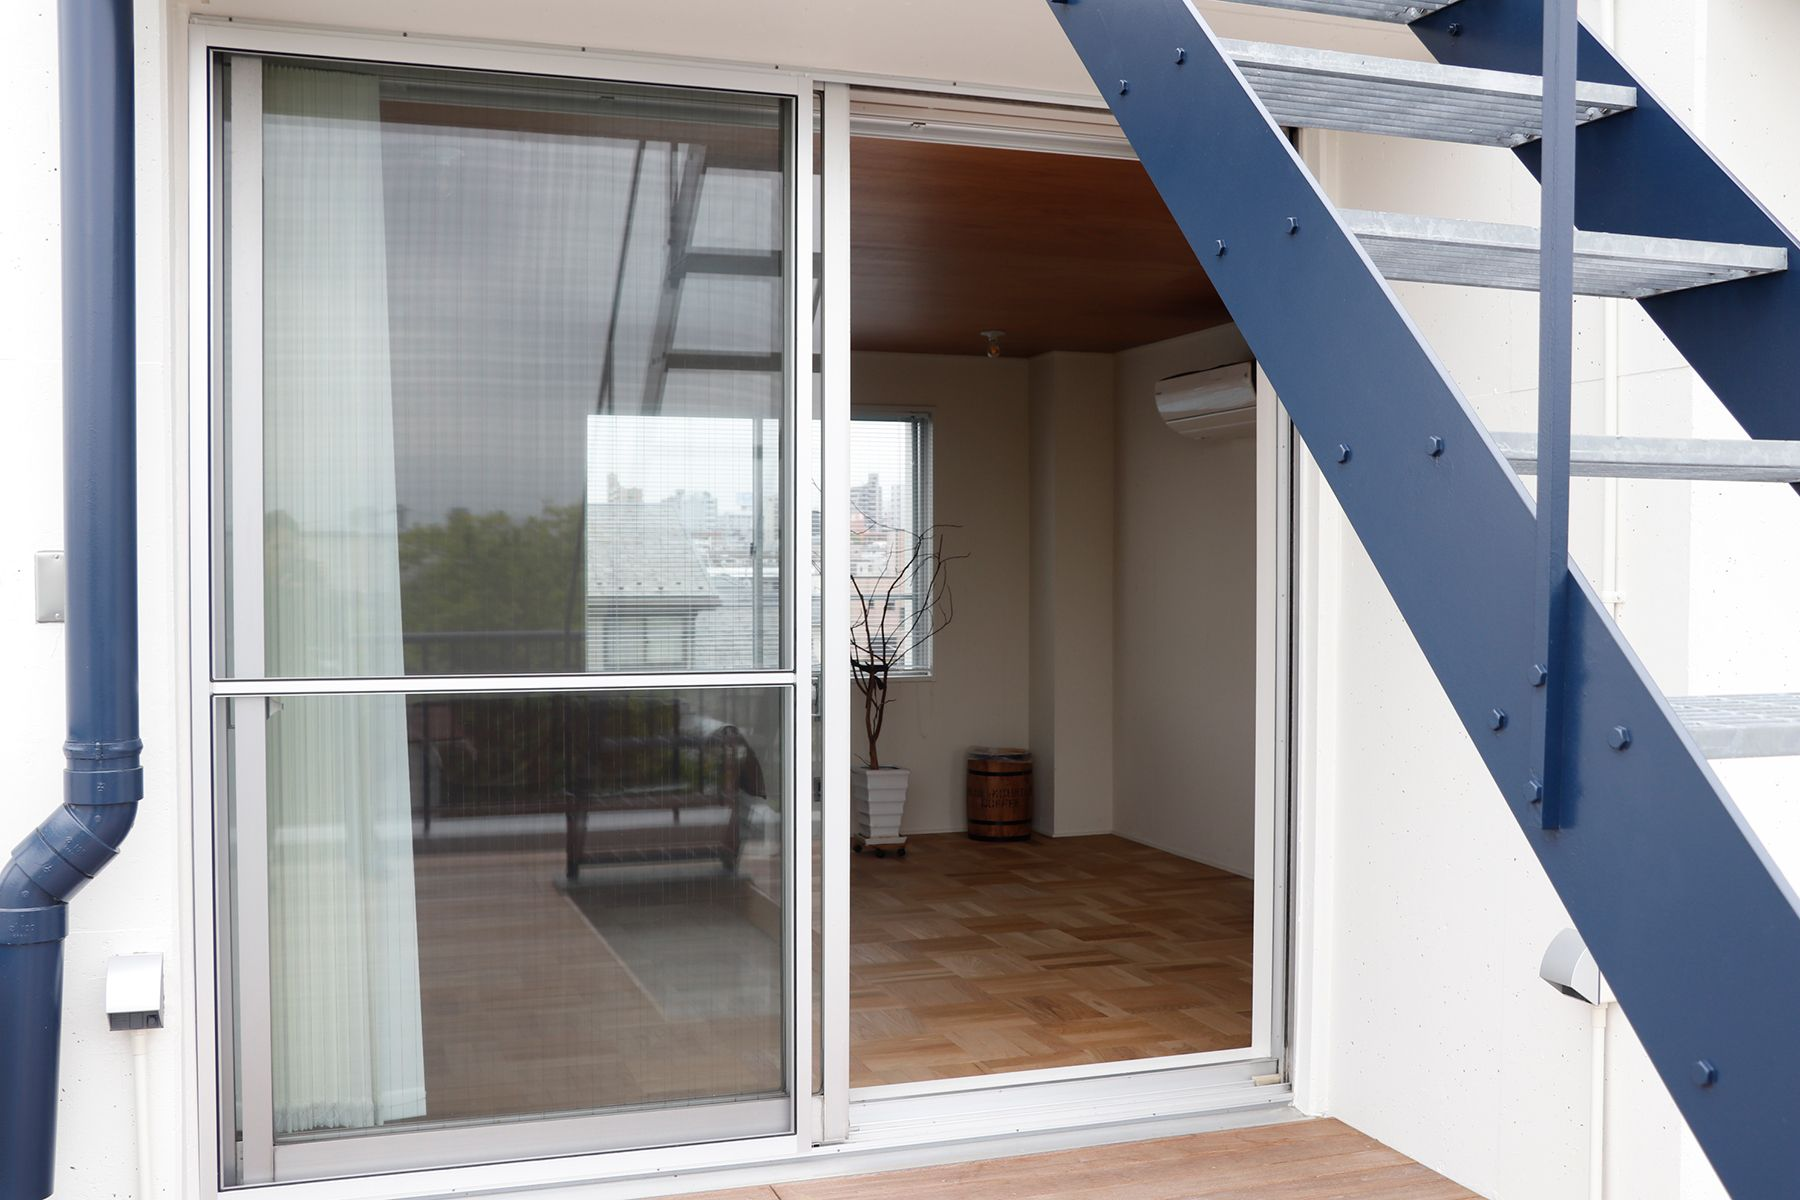 In the concrete/個人宅 (イン ザ コンクリート)3F バルコニーから部屋